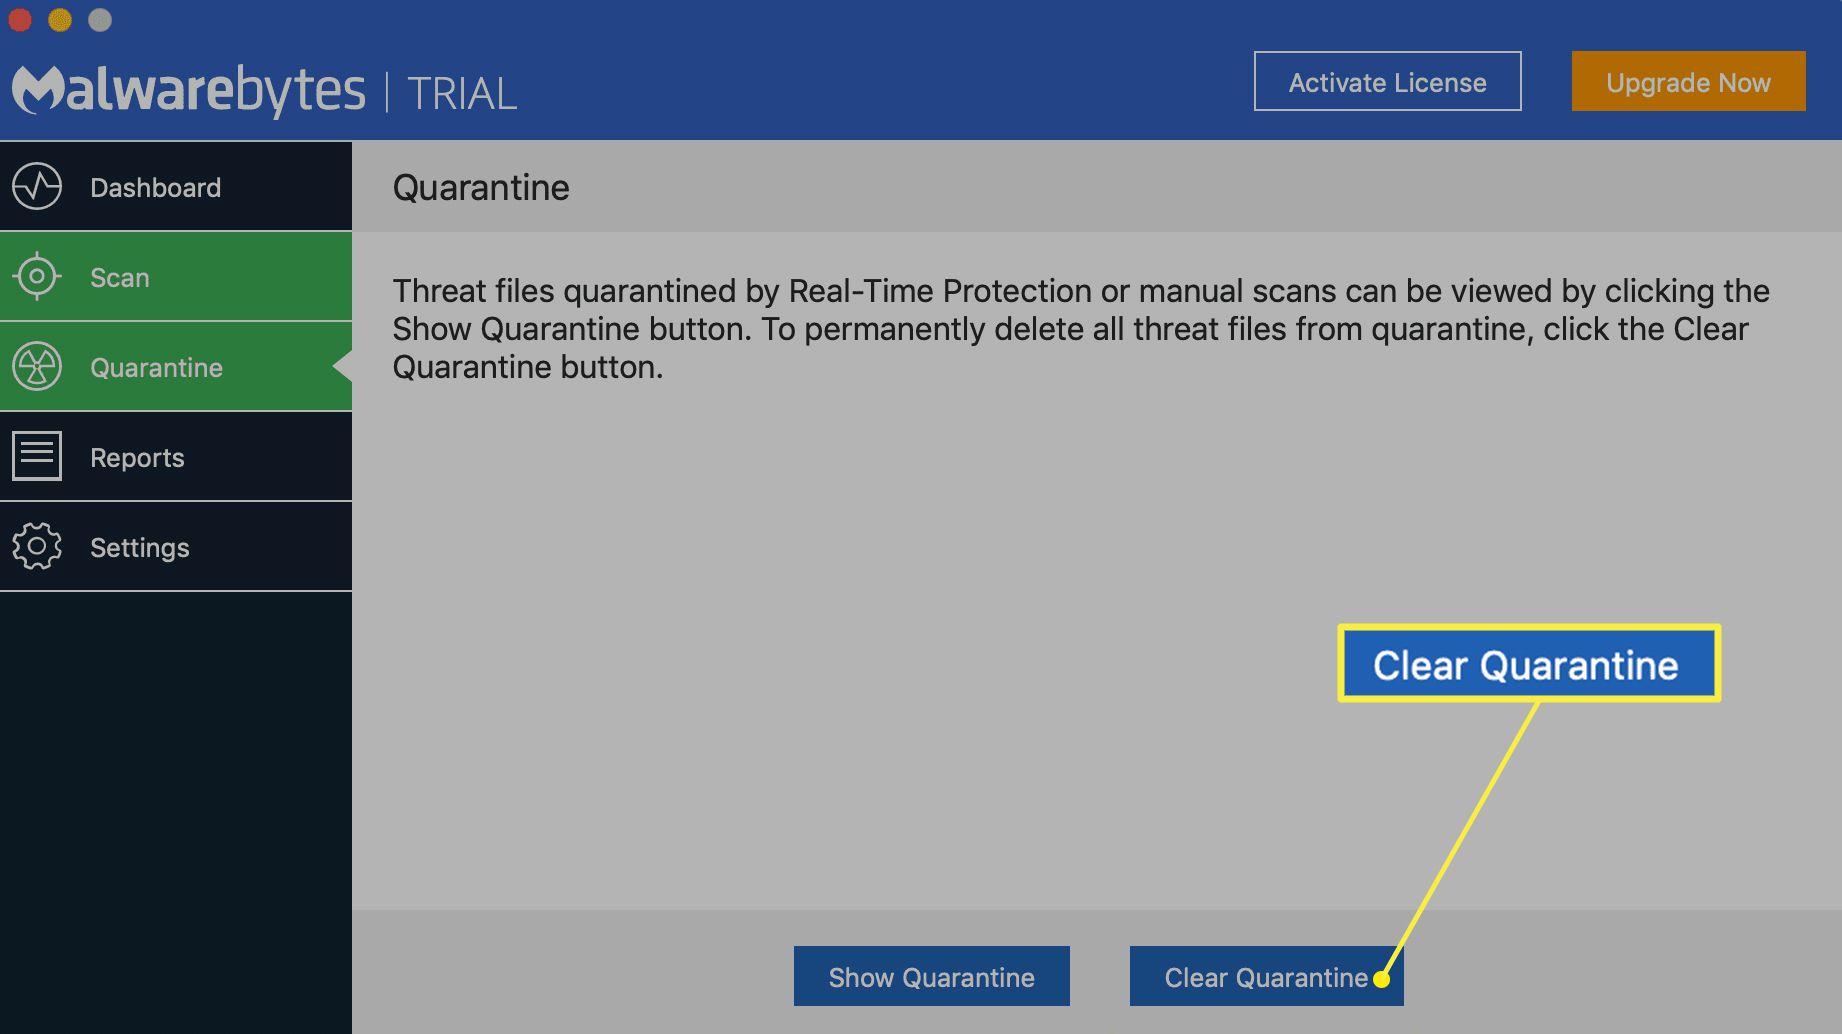 Malwarebytes for Mac quarantine list with Clear Quarantine button highlighted